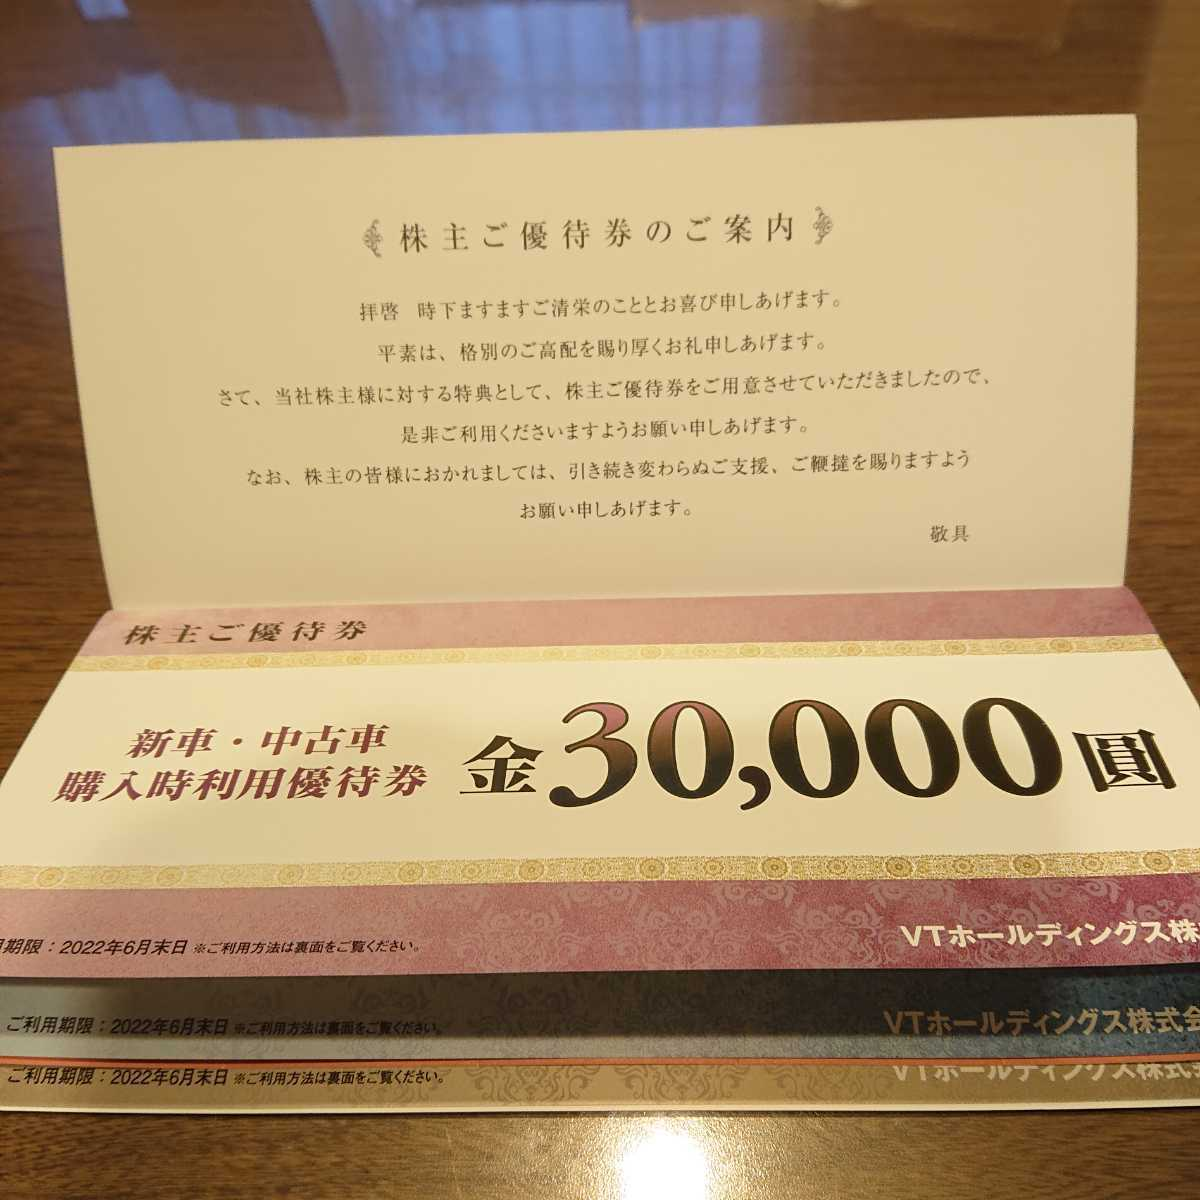 VTホールディングス株主優待 KeePer LABO20%割引券など (1冊:未使用)_画像4